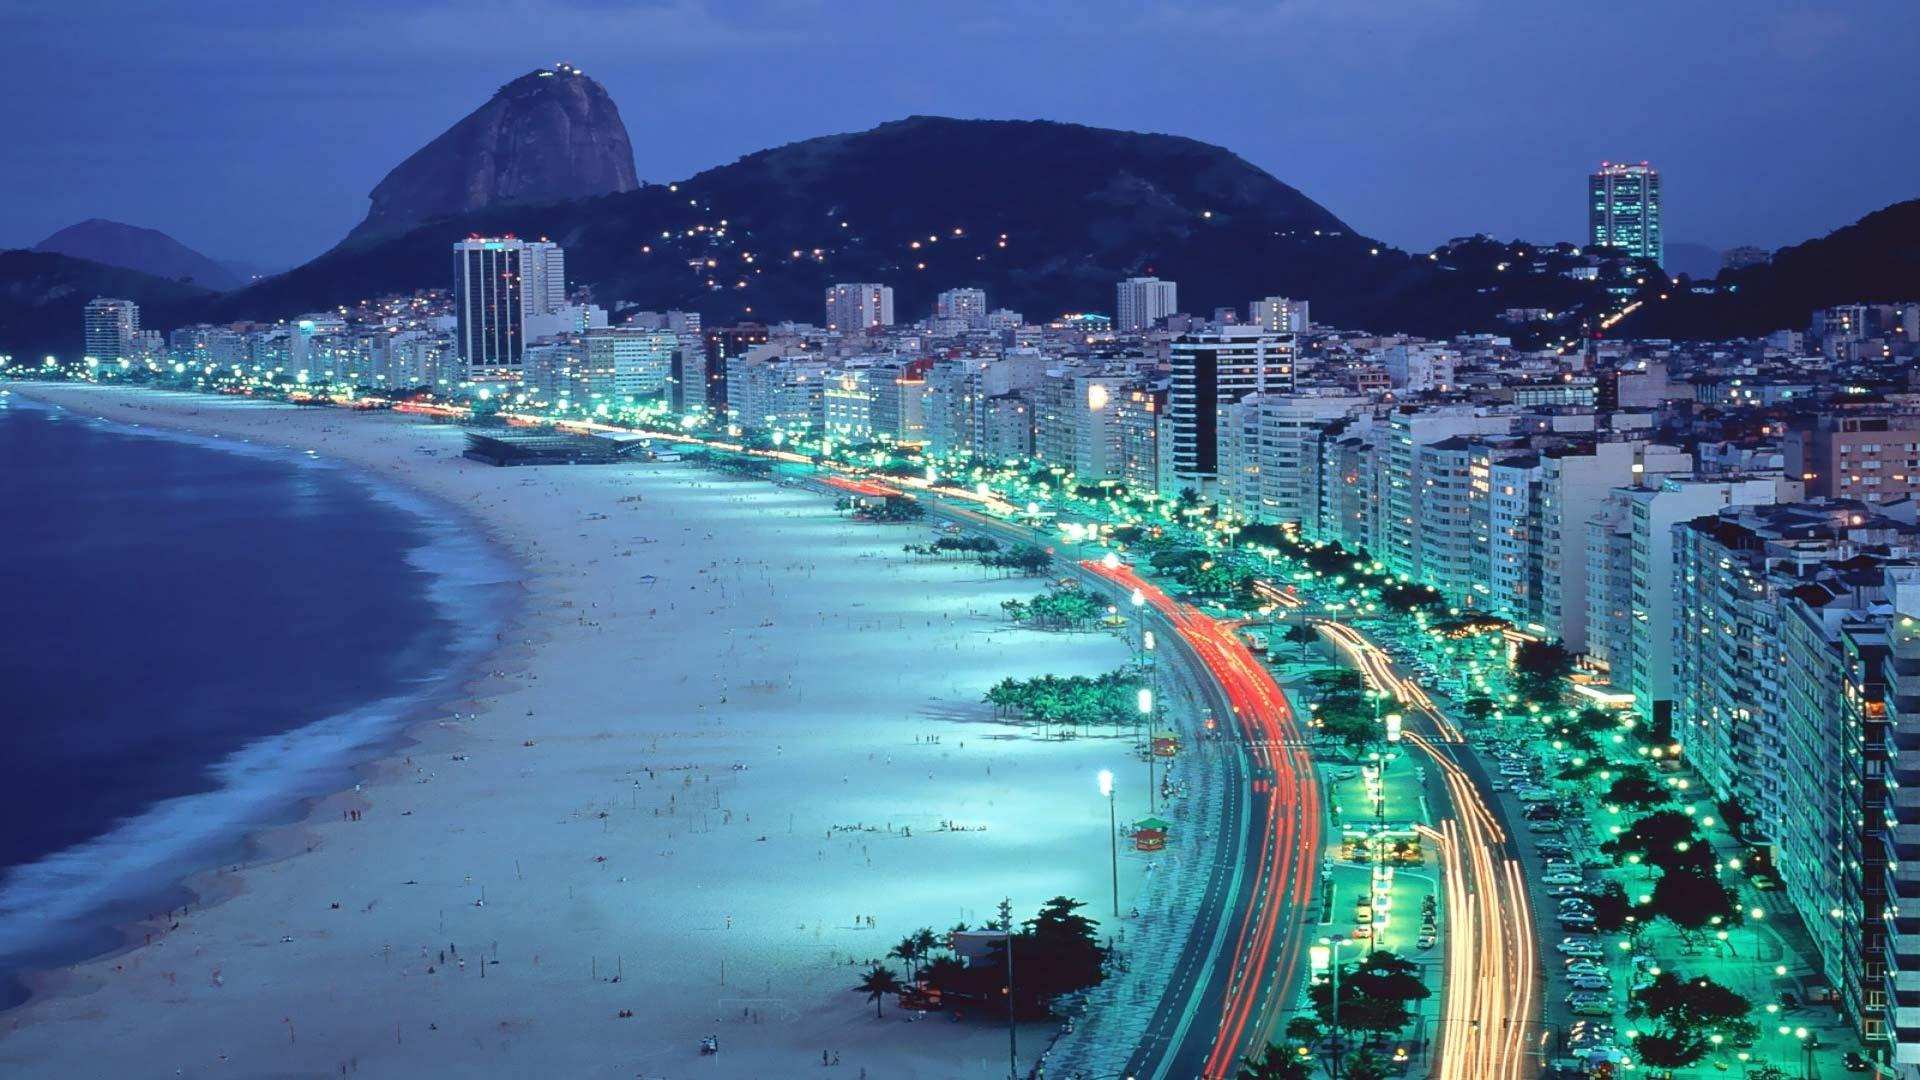 Fondo Escritorio Paisaje Ciudad Copacabana Con Fondos De Pantalla Hd Para Pc E Fondo Paisaje Ciudad Copacab Paisajes Fotografia Paisaje Fondos De Escritorio Hd